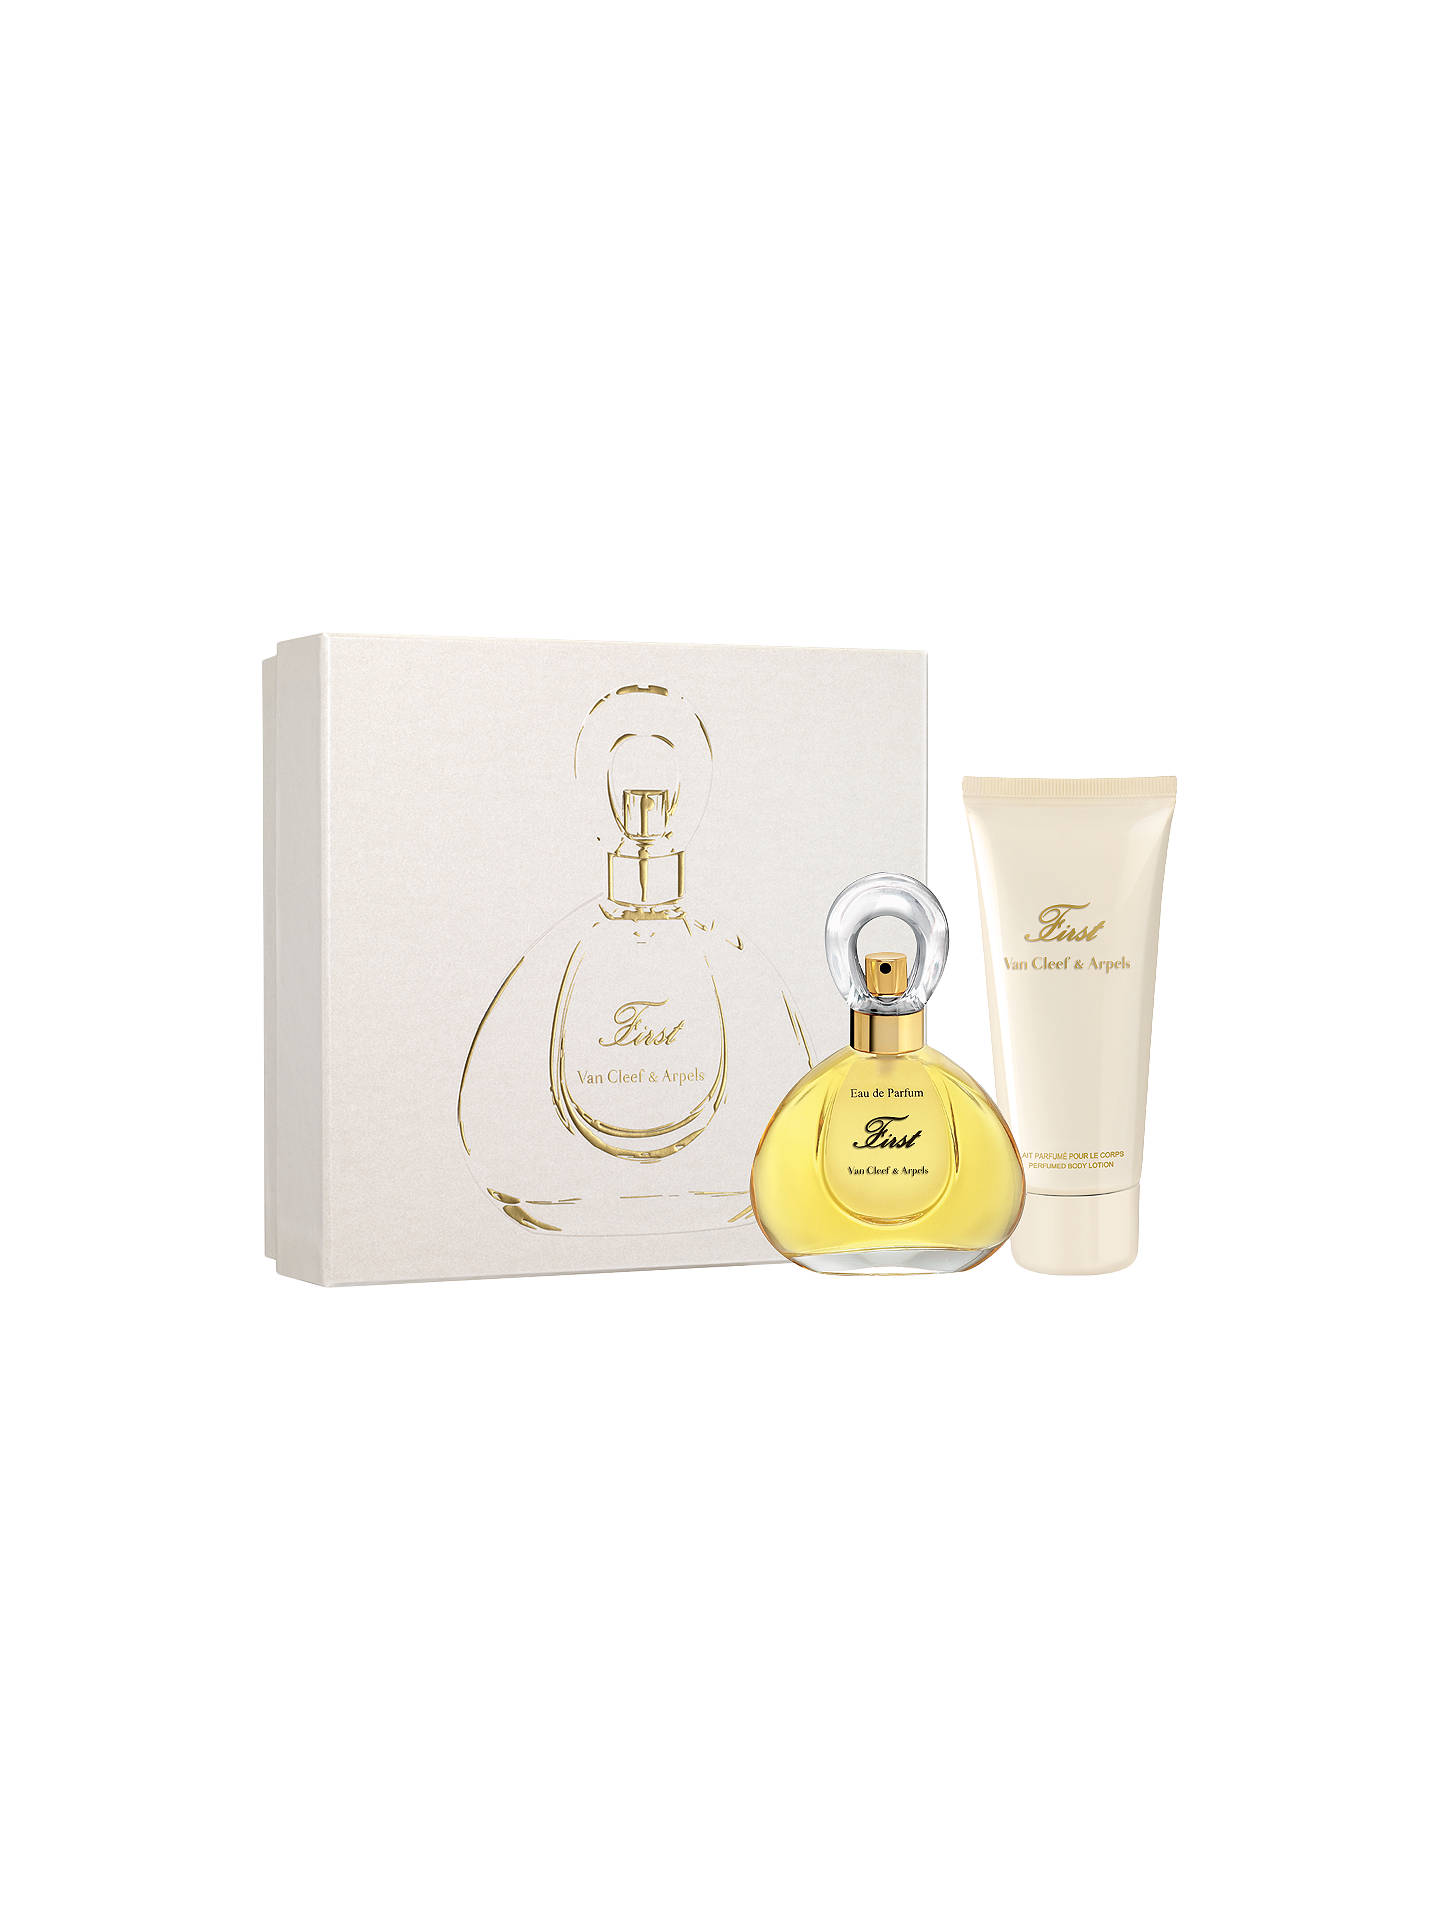 Van Cleef Arpels First 60ml Eau De Parfum Fragrance Gift Set At